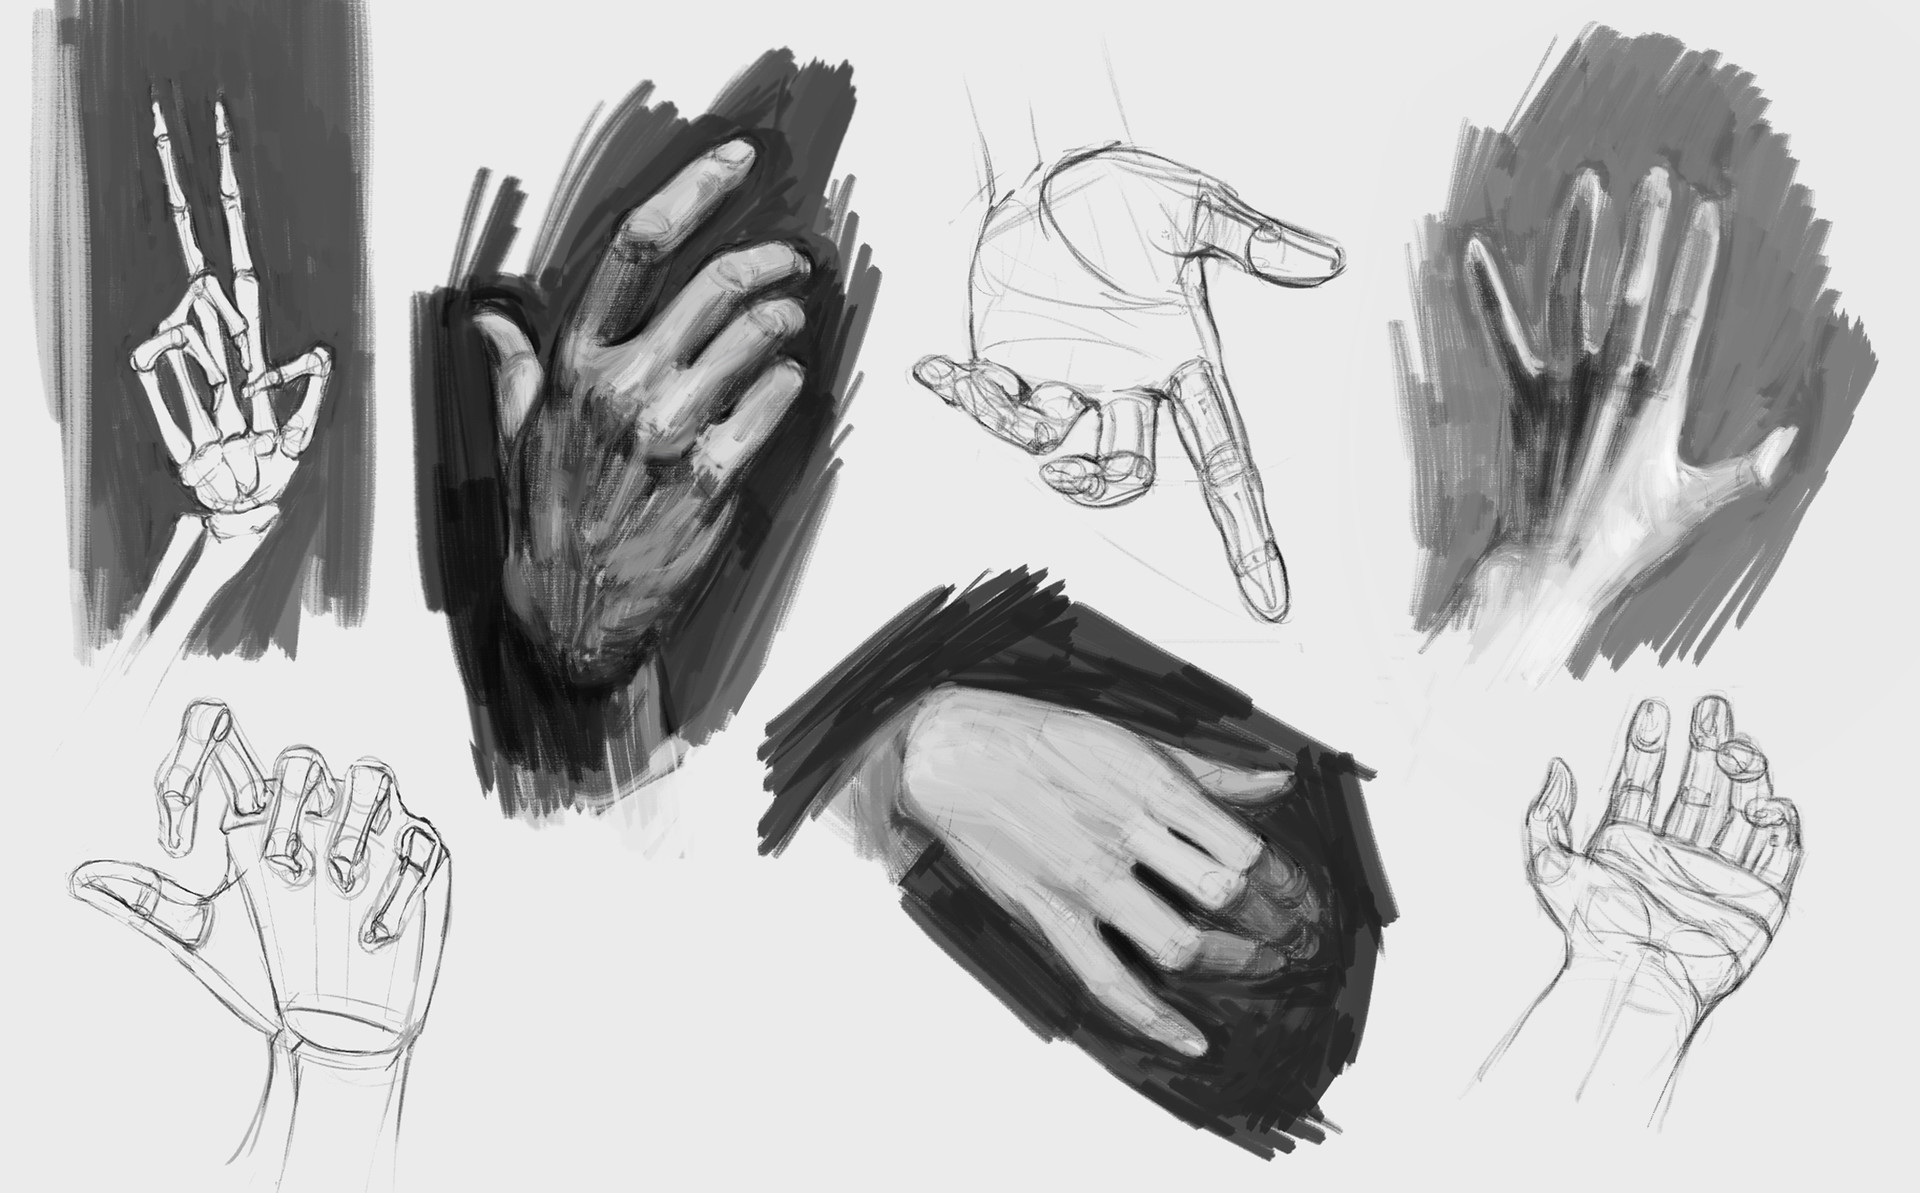 Bram sels hands